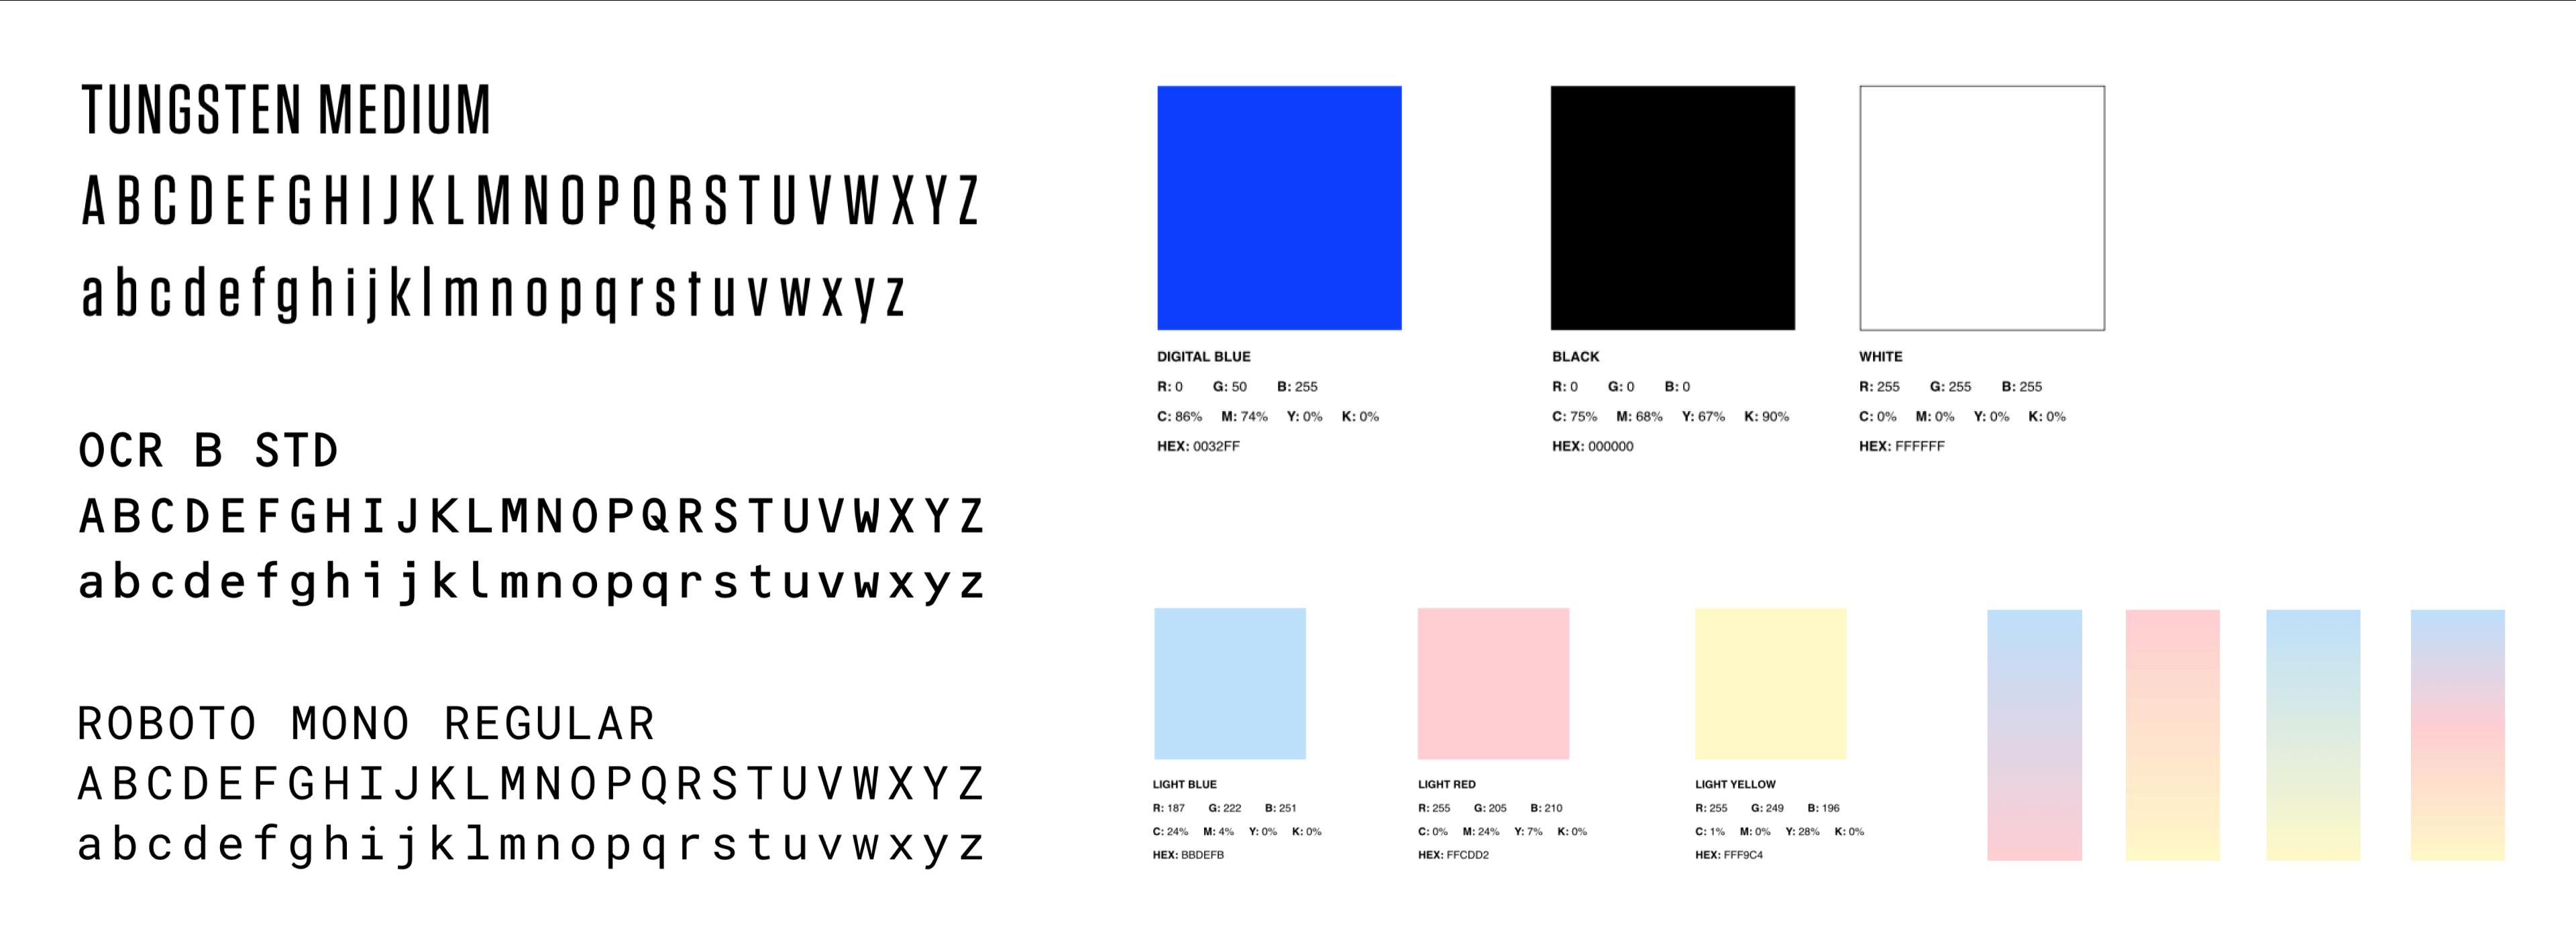 RCMA Typography & Color